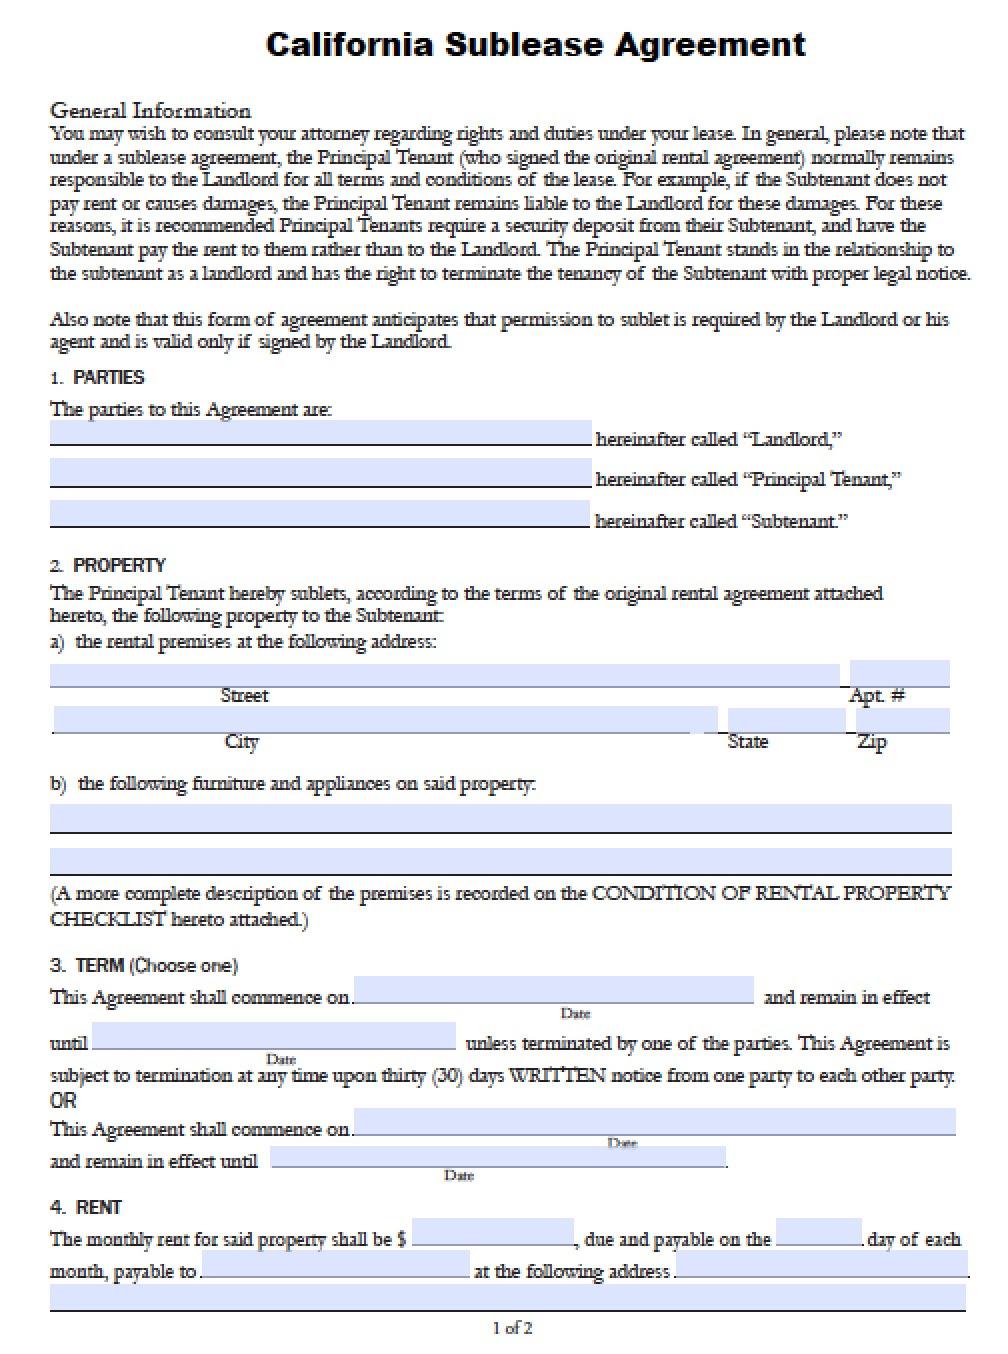 california sublease agreement version 2